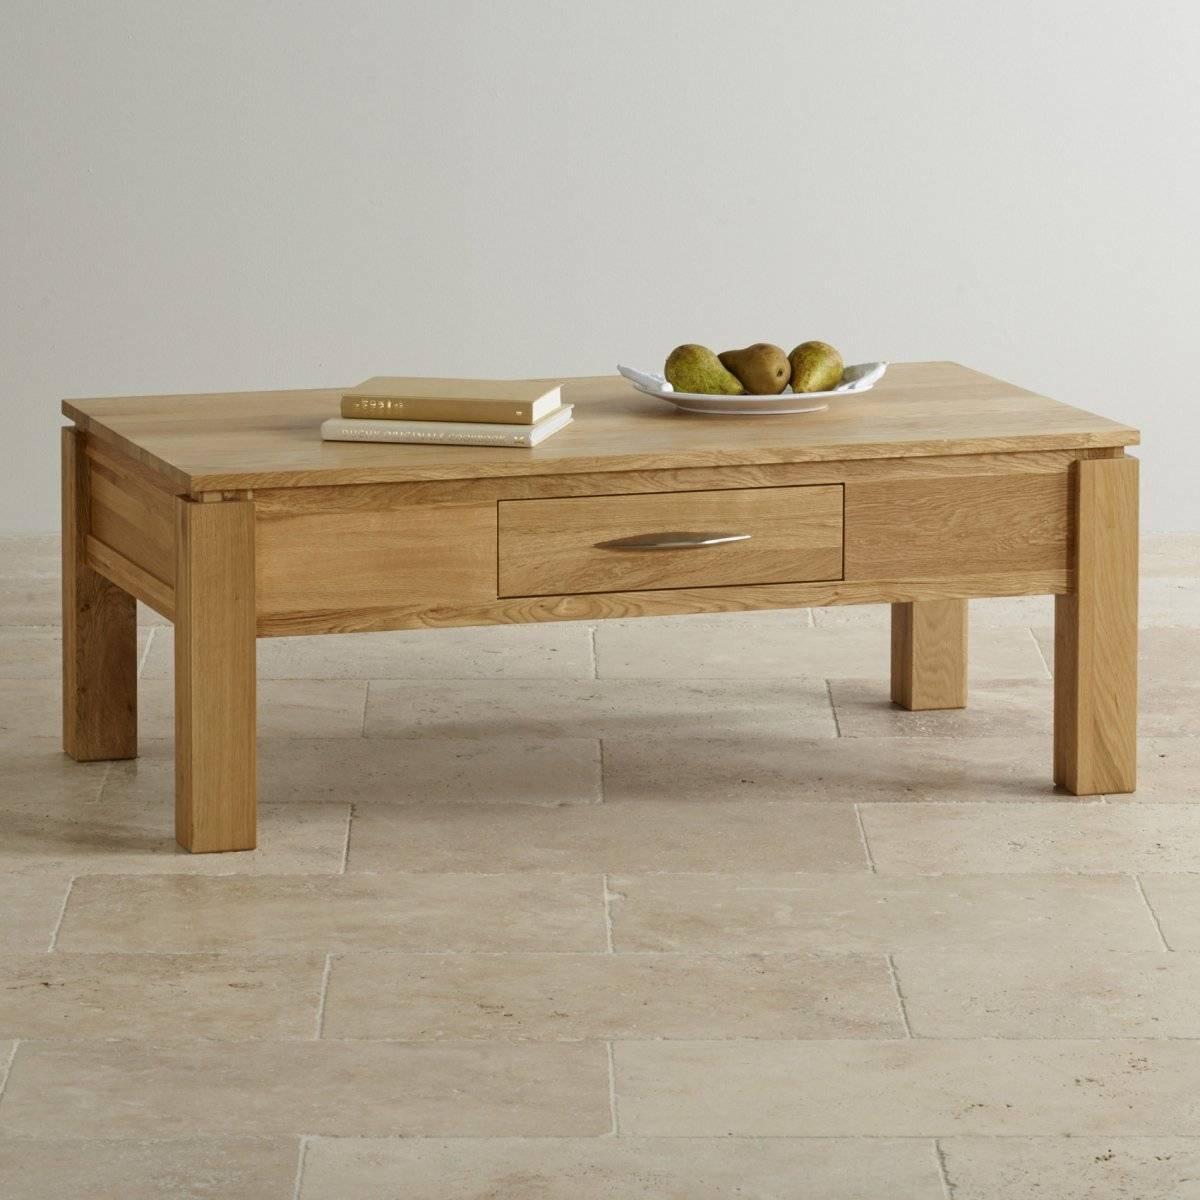 Galway Large Coffee Table In Solid Oak | Oak Furniture Land In Oak Wood Coffee Tables (View 7 of 15)